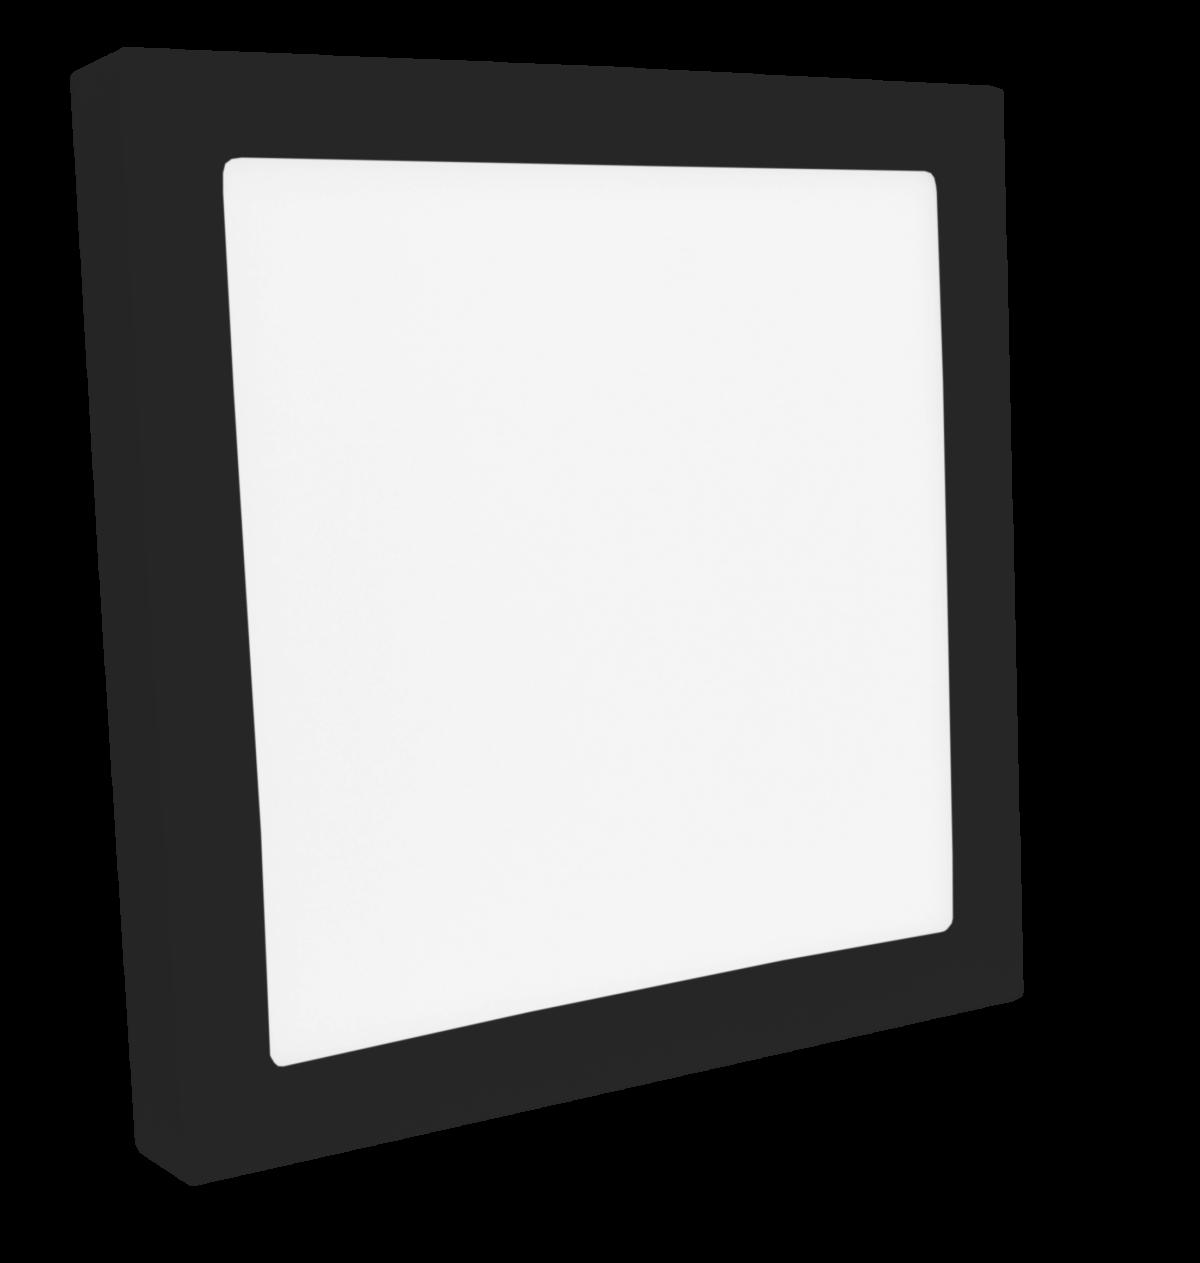 Luminária Sobrepor LED Save Energy SE-240.1639 Jet Black 36W 5700K Bivolt 400x400mm Preto